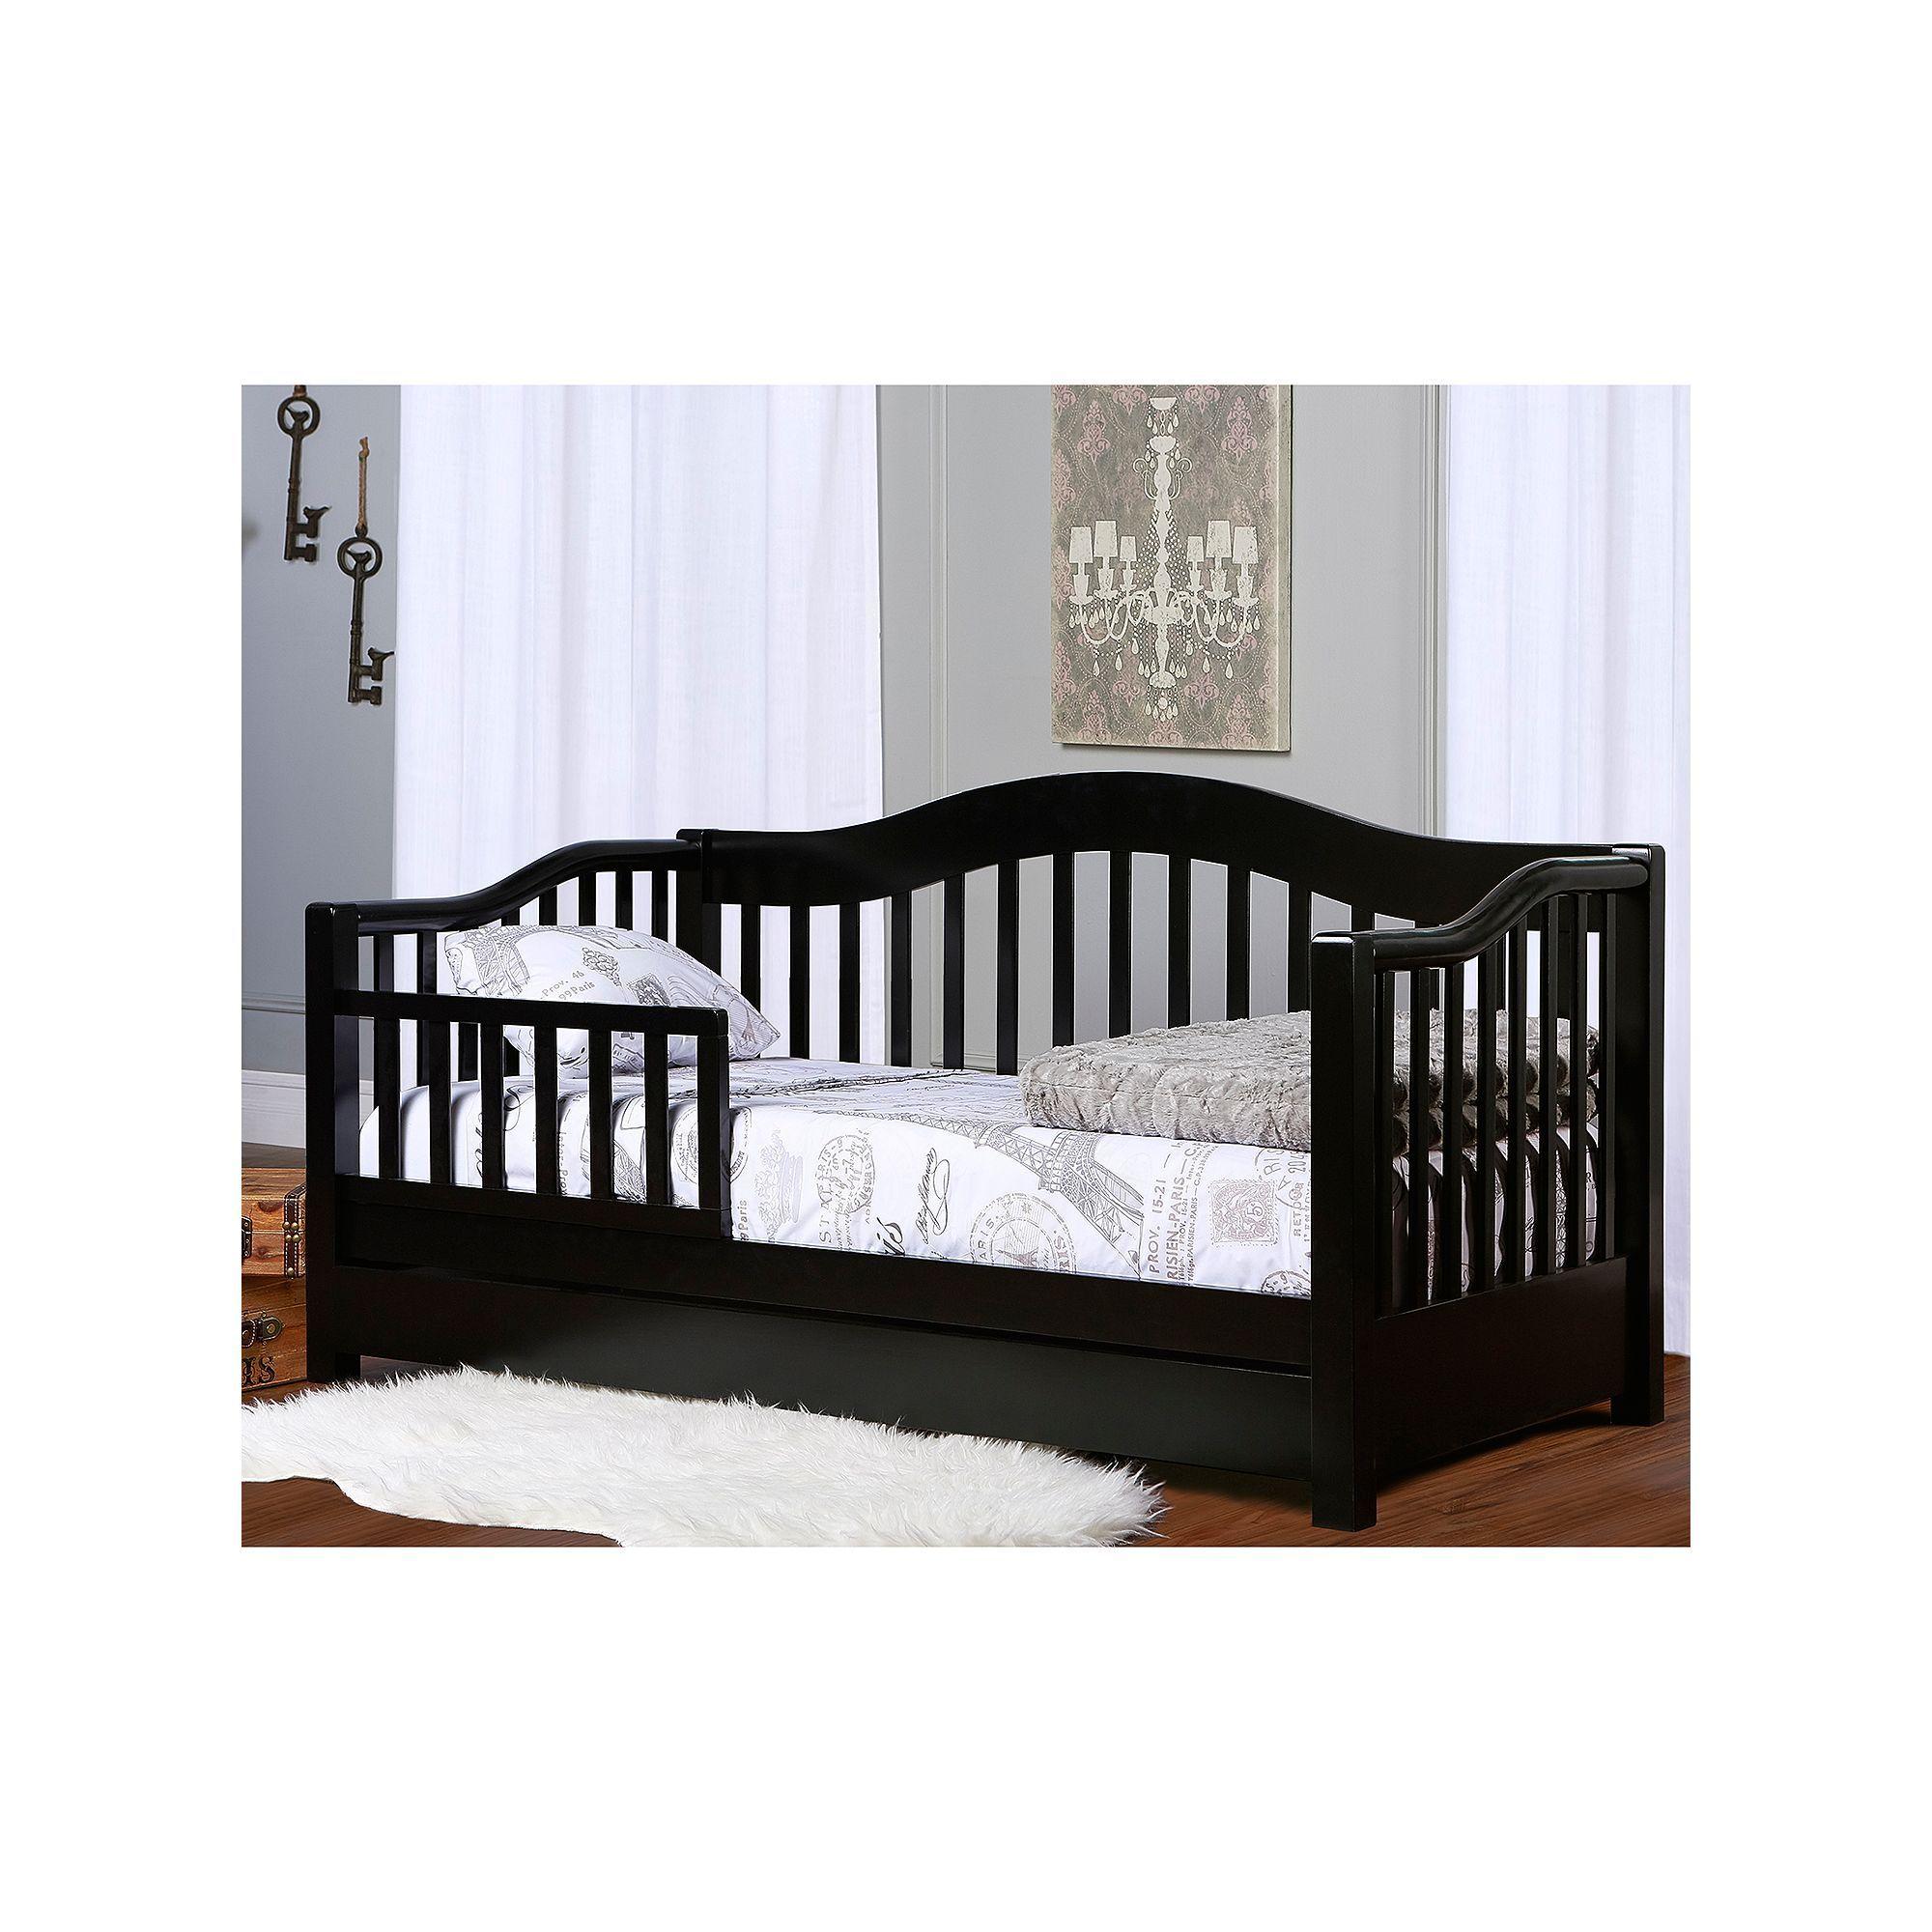 Dream On Me Toddler Day Bed Black Toddler Day Bed Toddler Bed